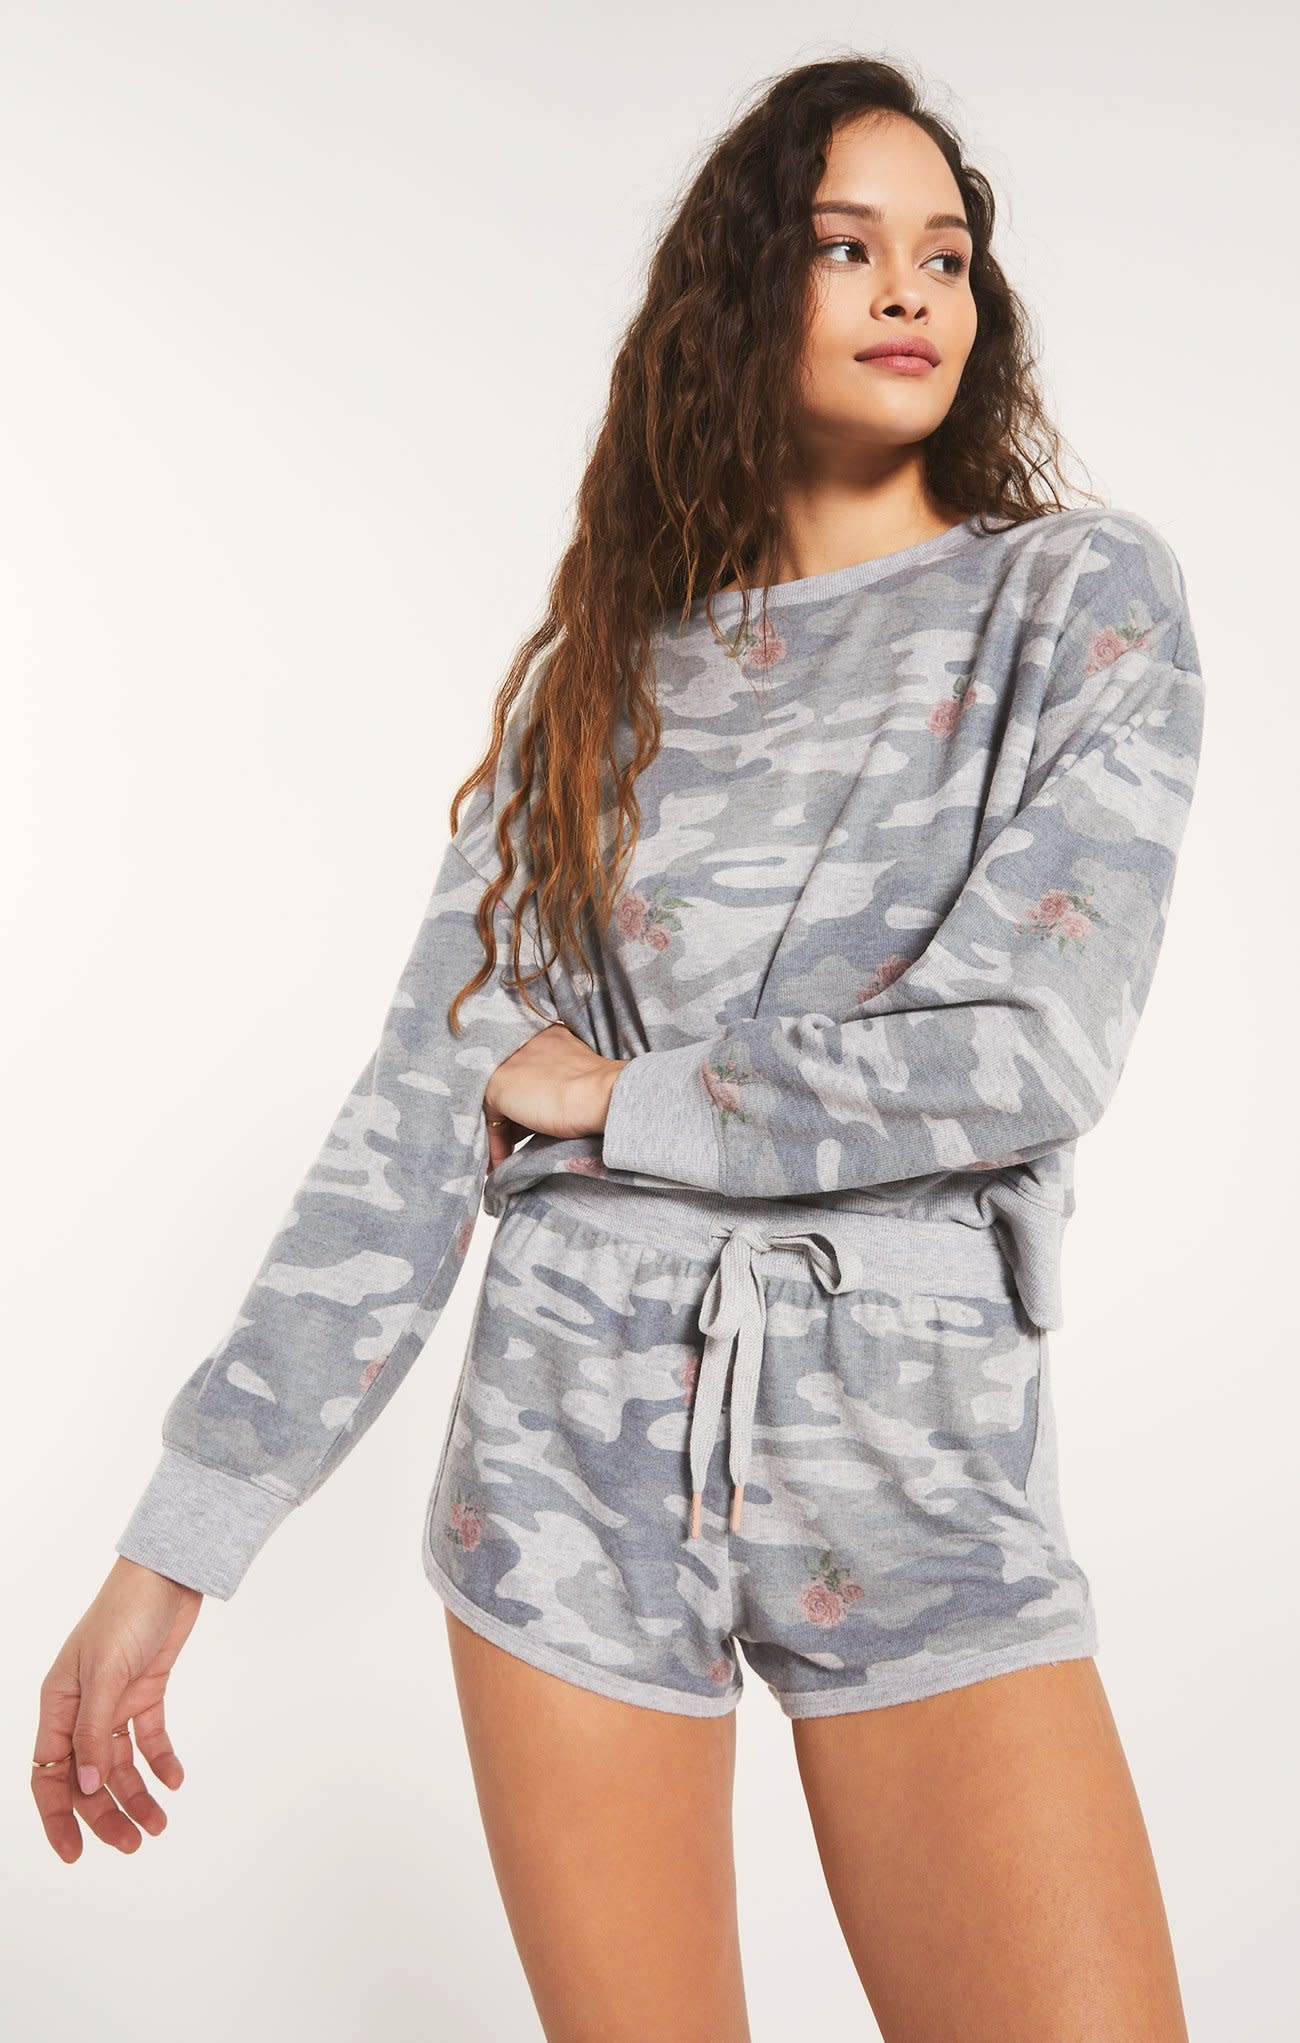 Z Supply Elle Rose Camo L/S Sweatshirt